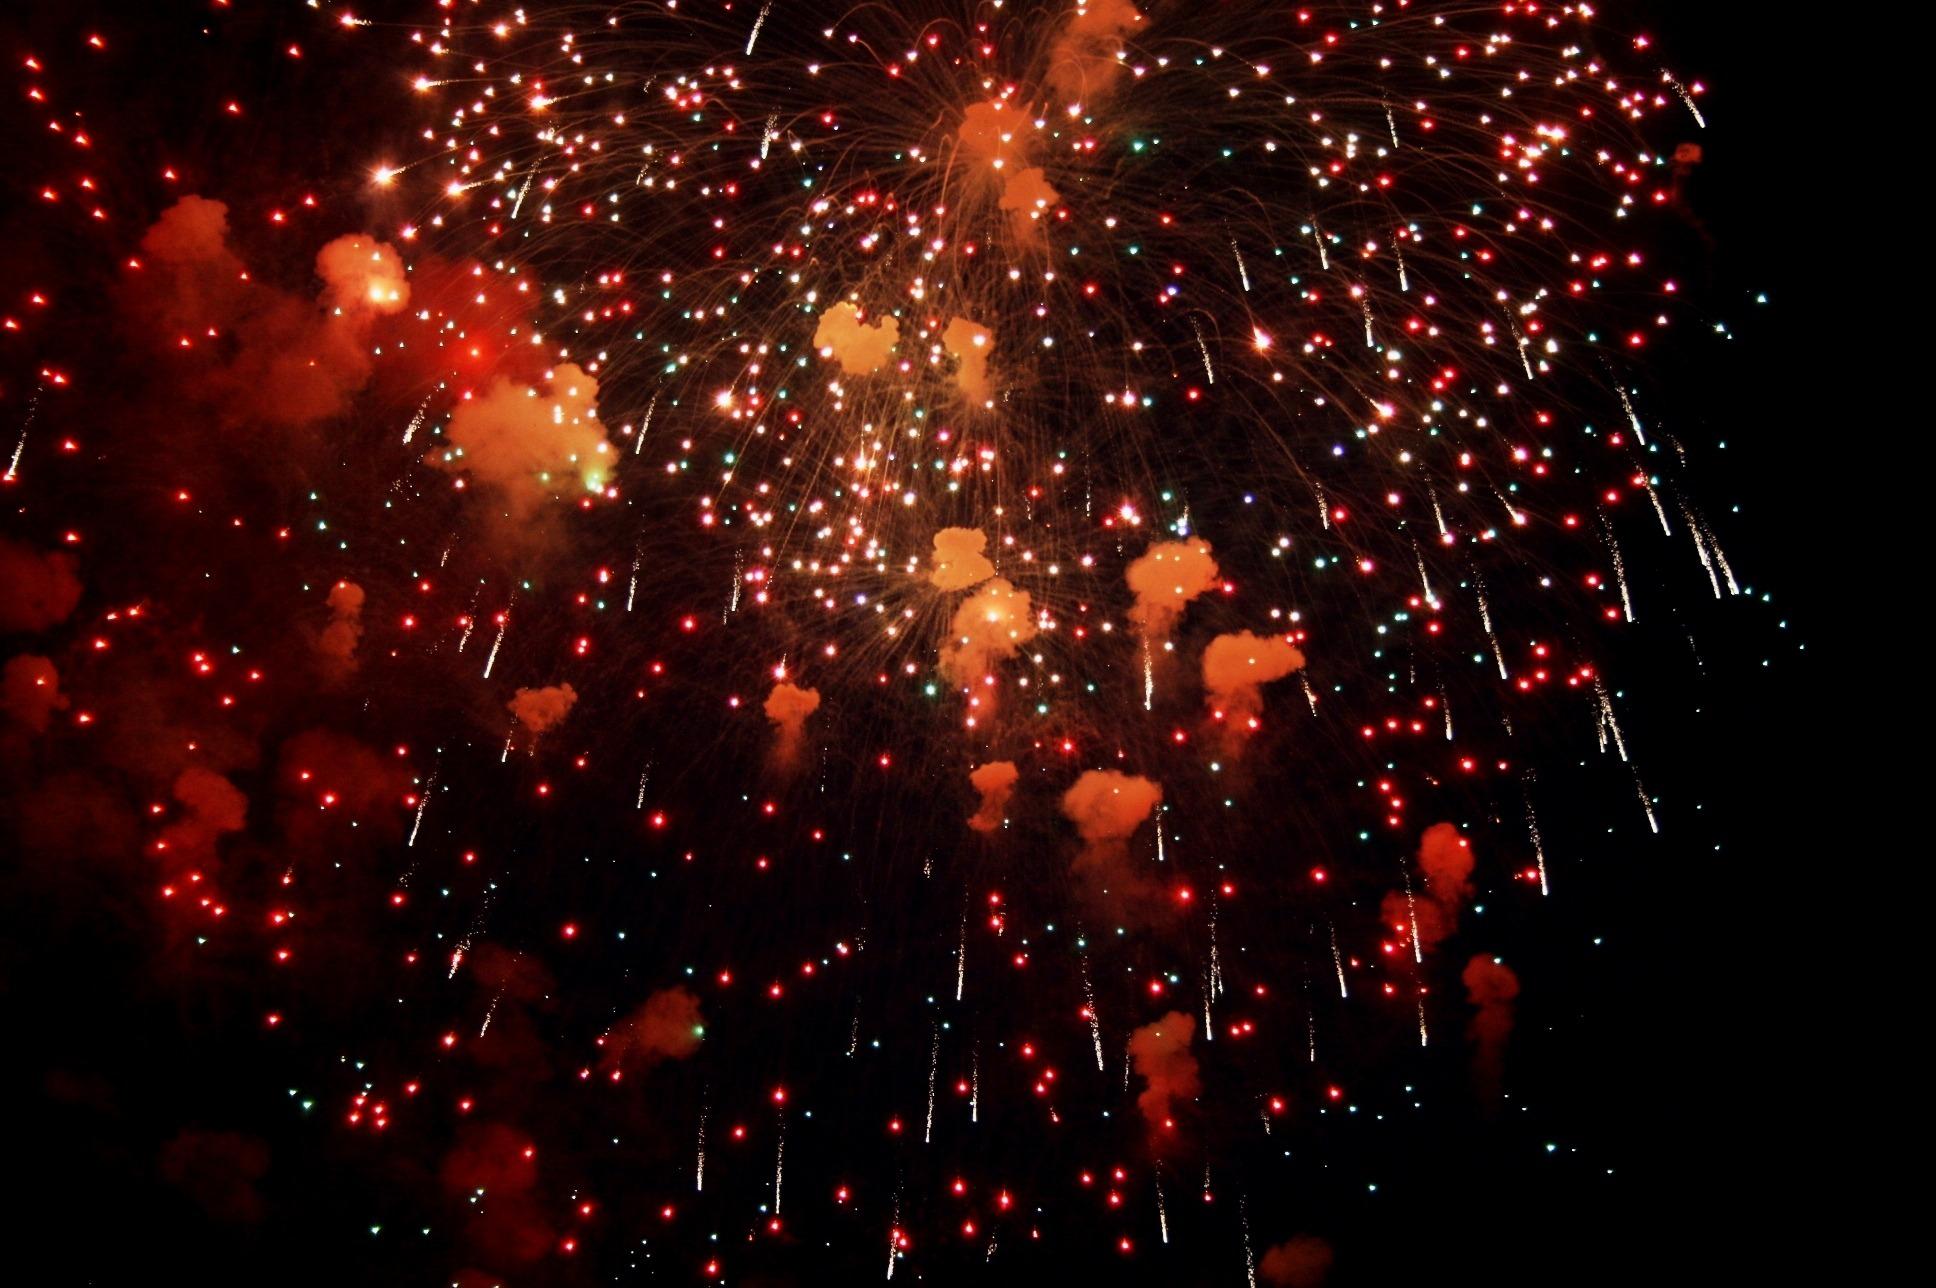 Gambar langit merokok jeruk merah ruang kegelapan ledakan gambar langit merokok jeruk merah ruang kegelapan ledakan festival kembang api pesta puff peristiwa tengah malam diwali menarik voltagebd Images